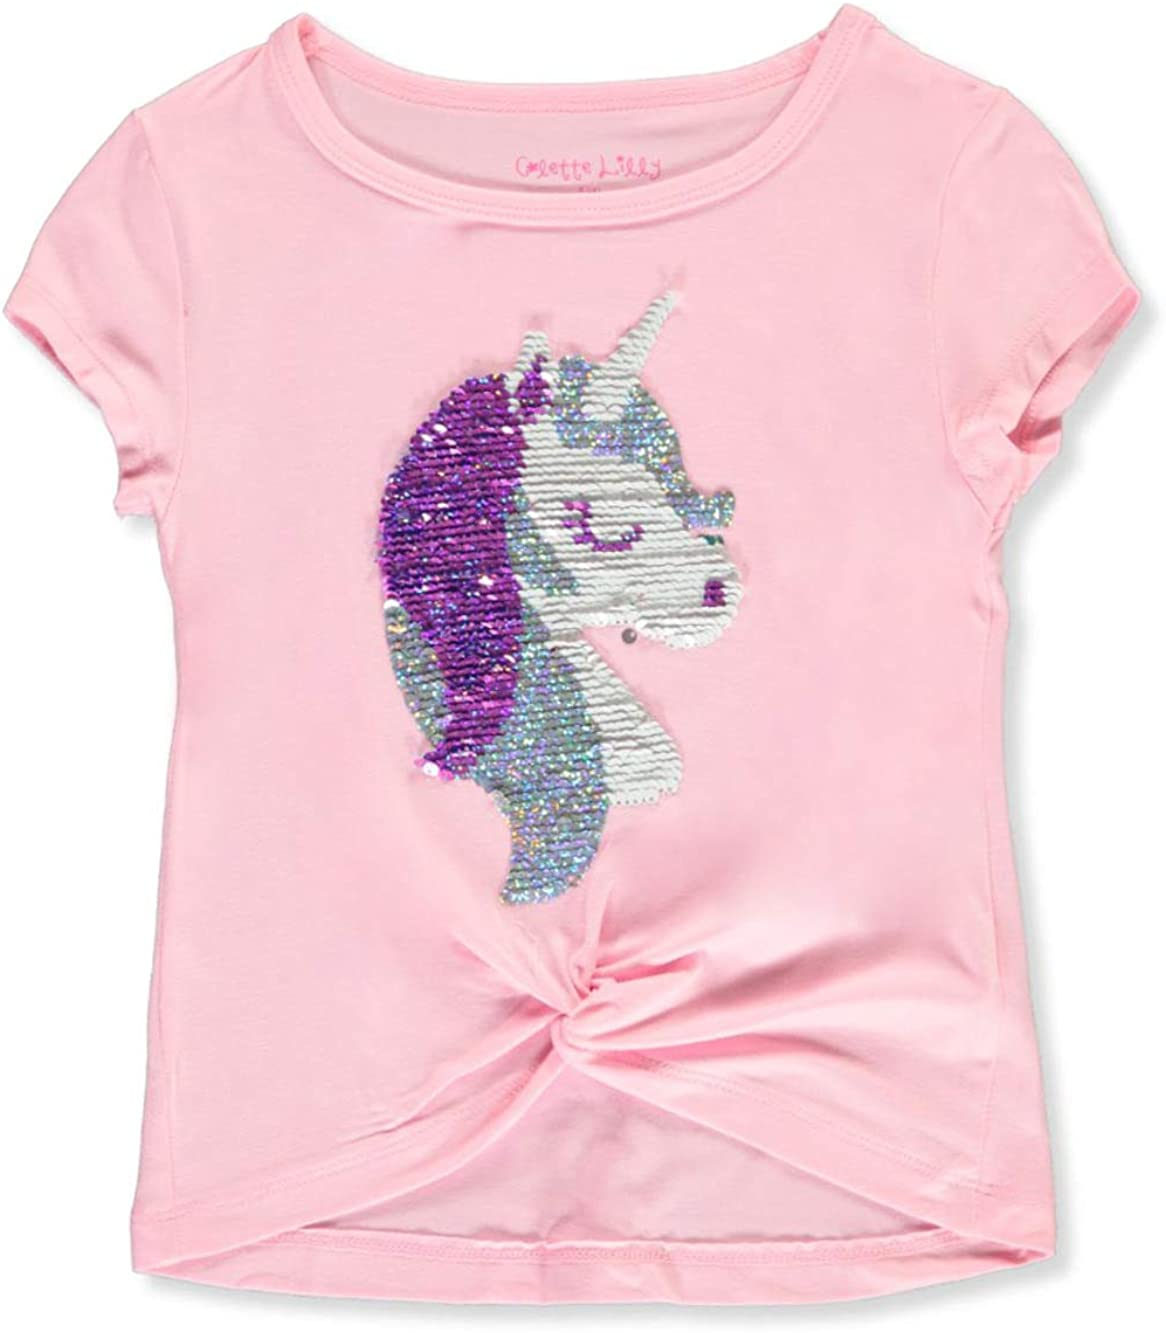 Colette Lilly Girls Flip Sequin Unicorn Top